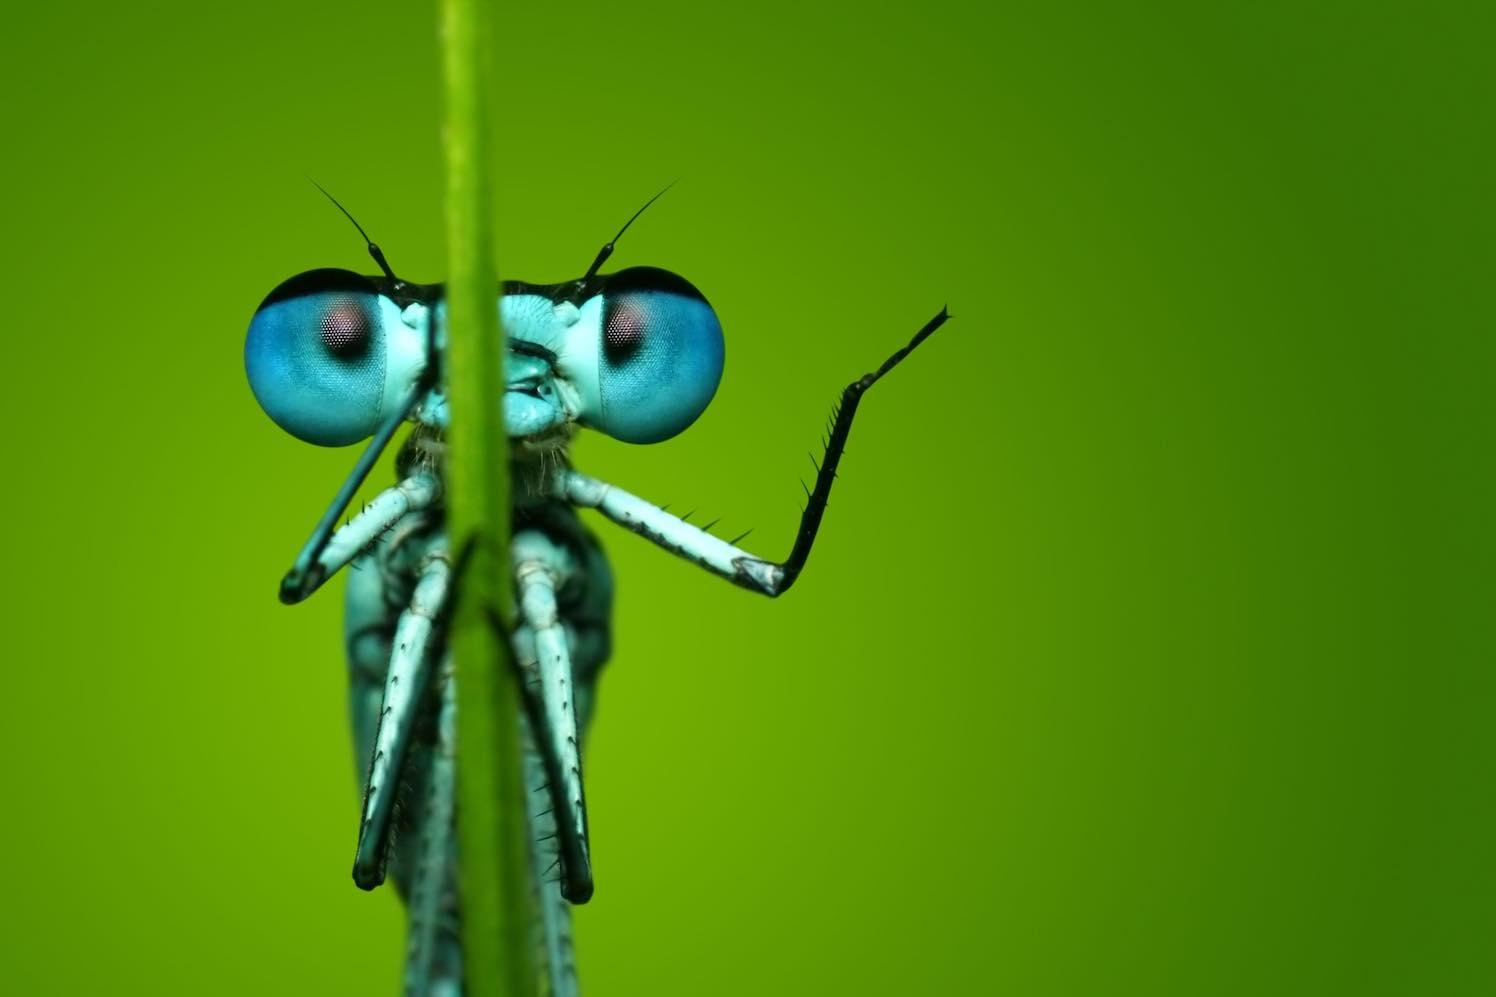 reizende insectenexpo azuurwaterjuffer